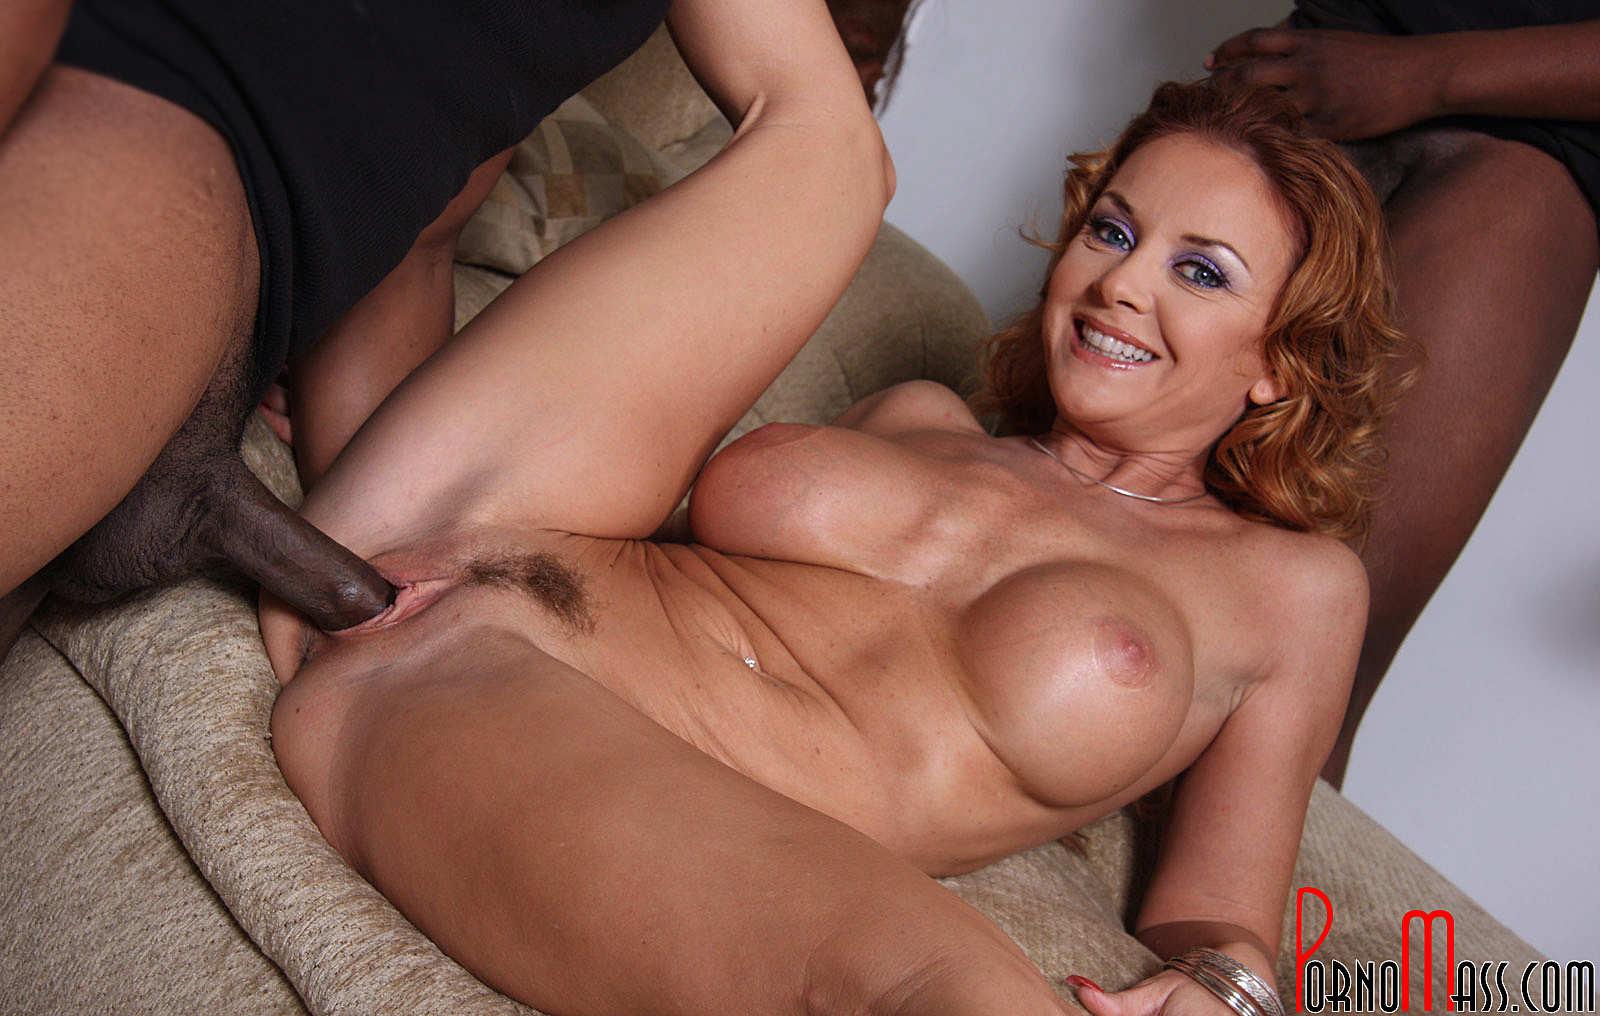 Mature nude порно онлайн